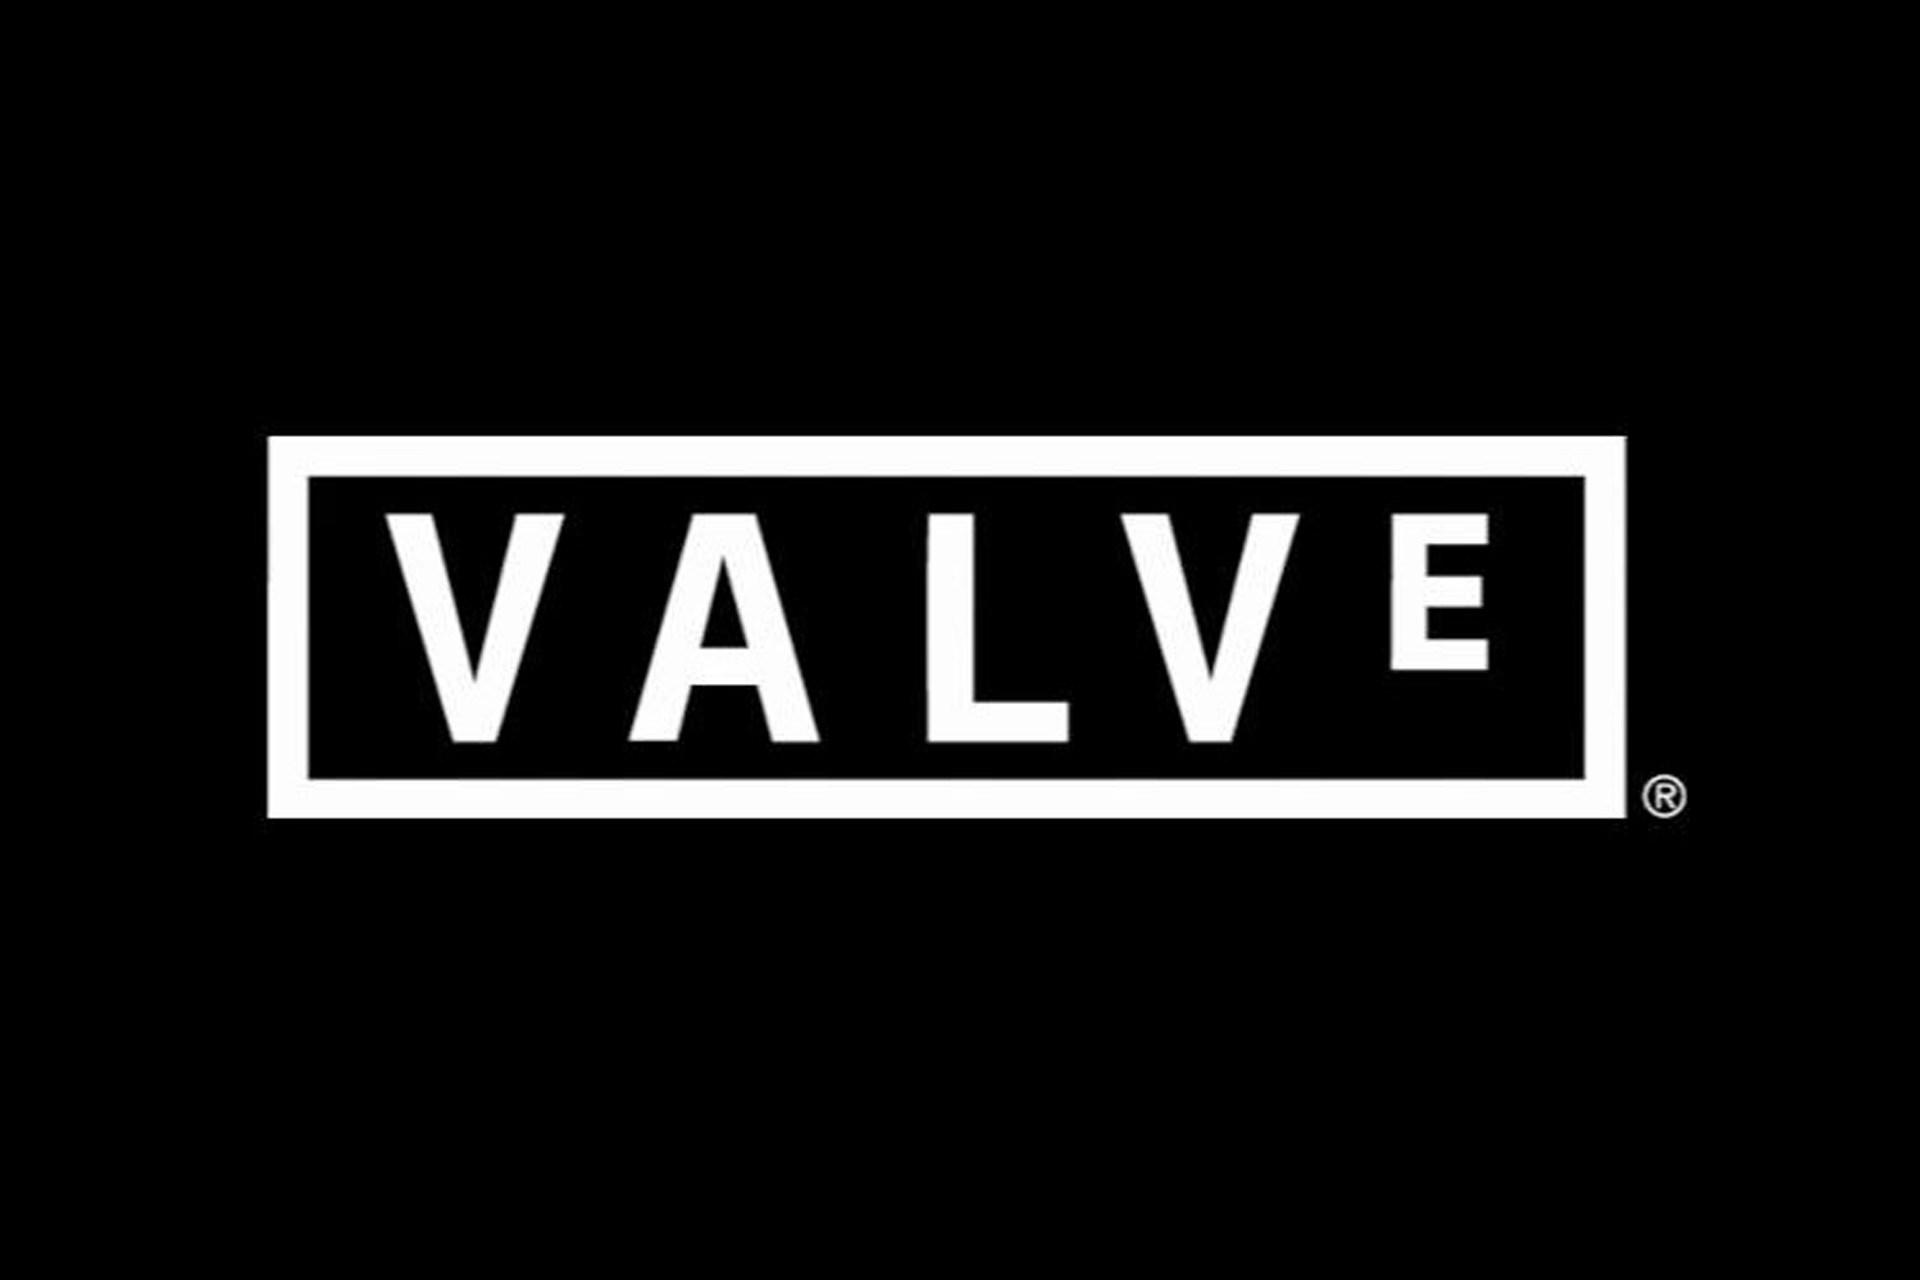 Valve به فکر عرضه بازیهای جدید است